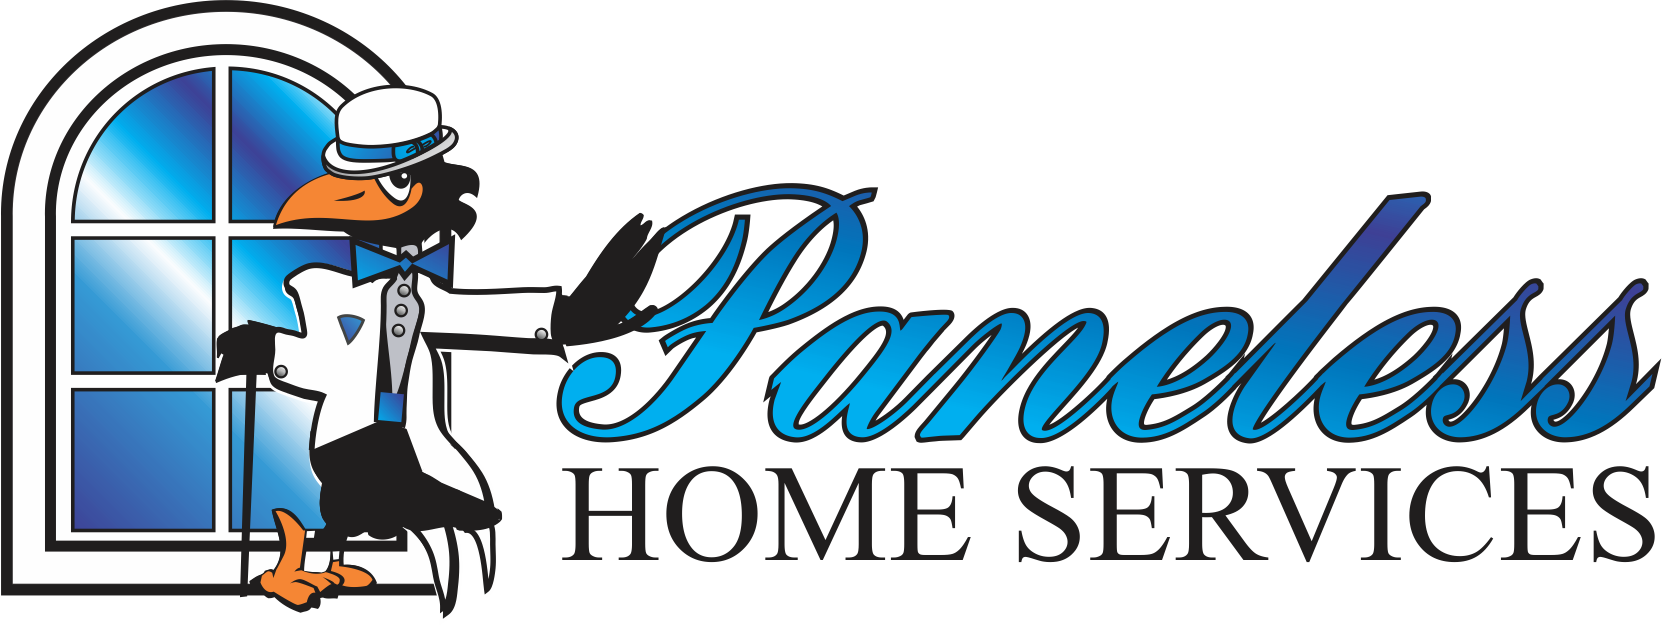 Paneless Home Services logo